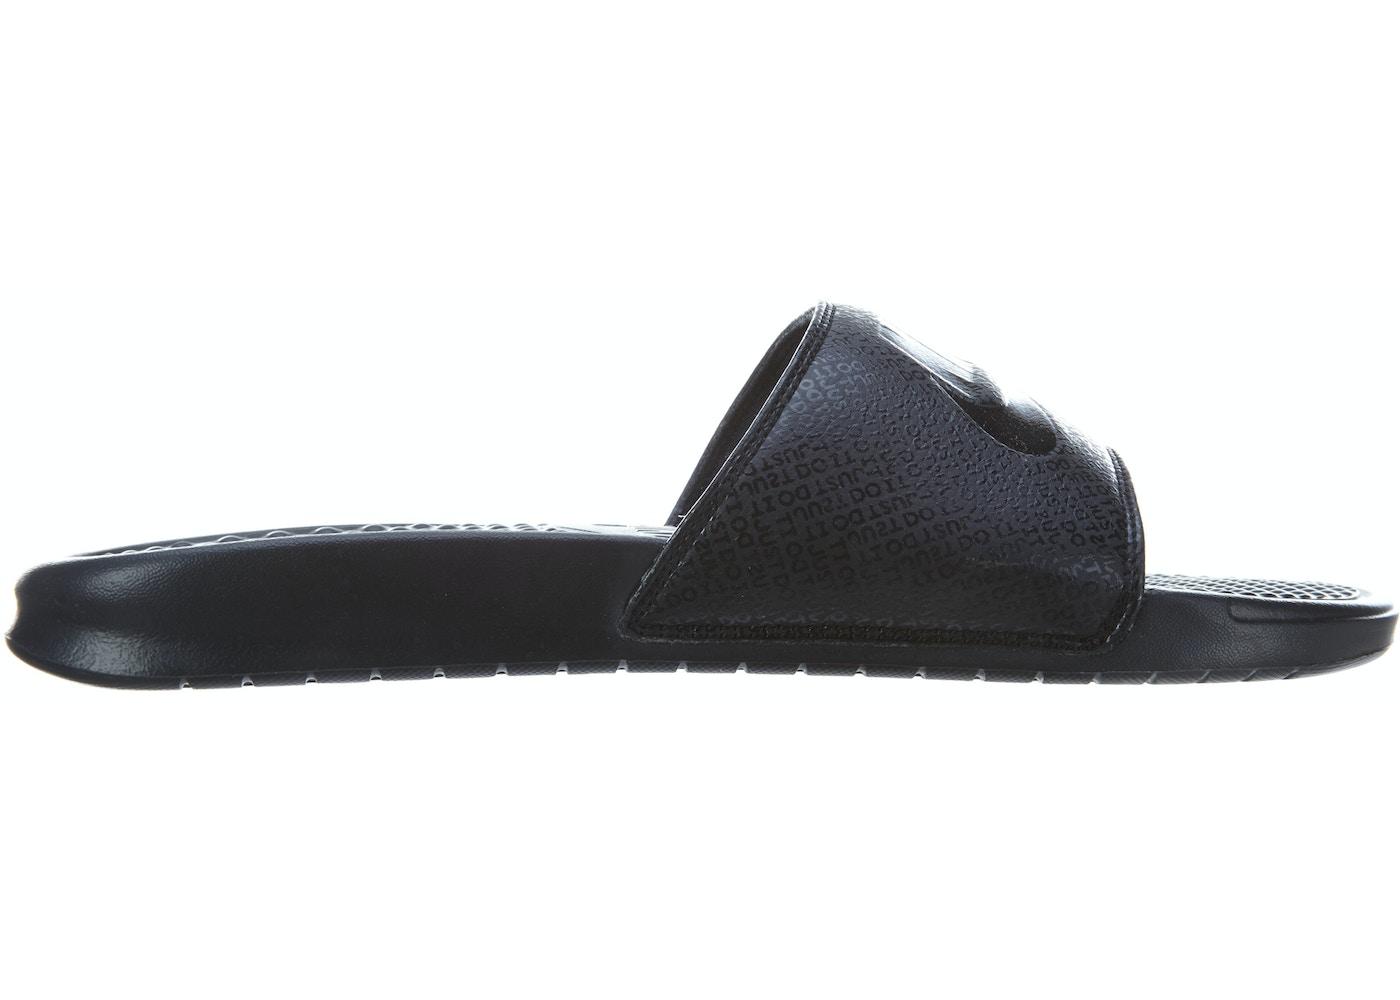 Nike Benassi Jdi Black - 343880-001 f8393094b